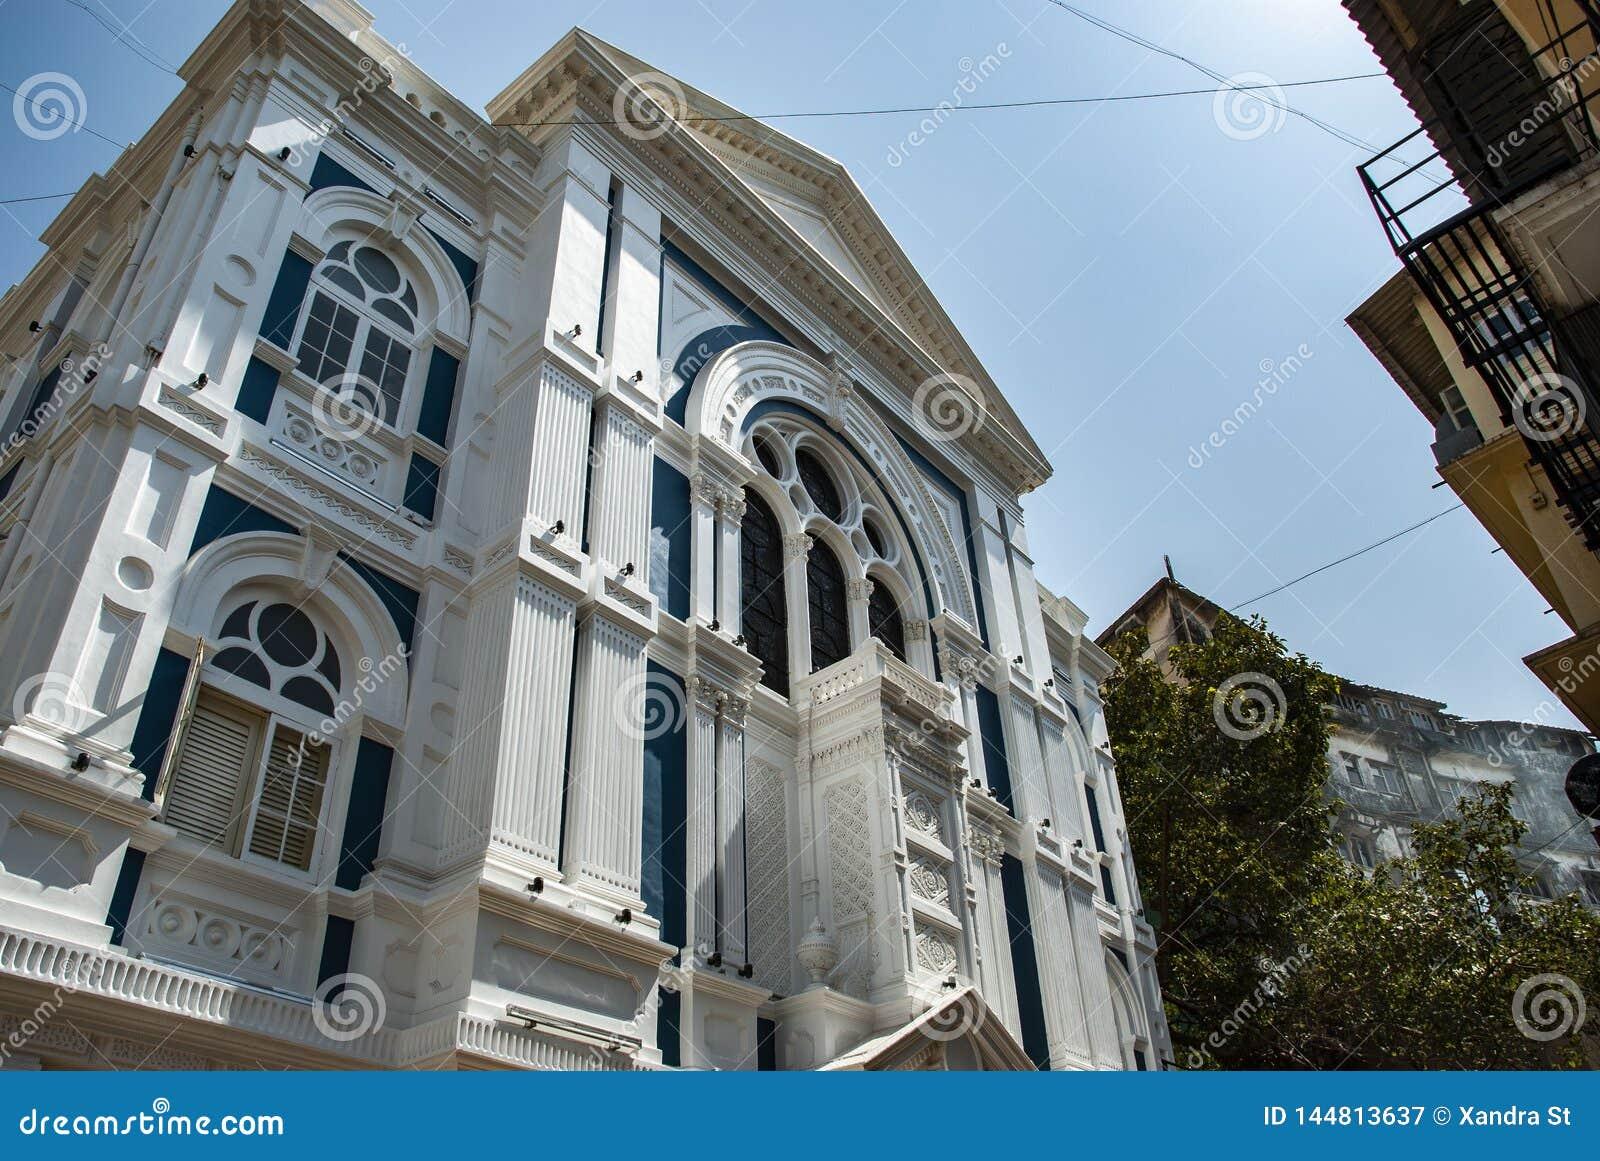 Sinagoga ebrea in Mumbai in India